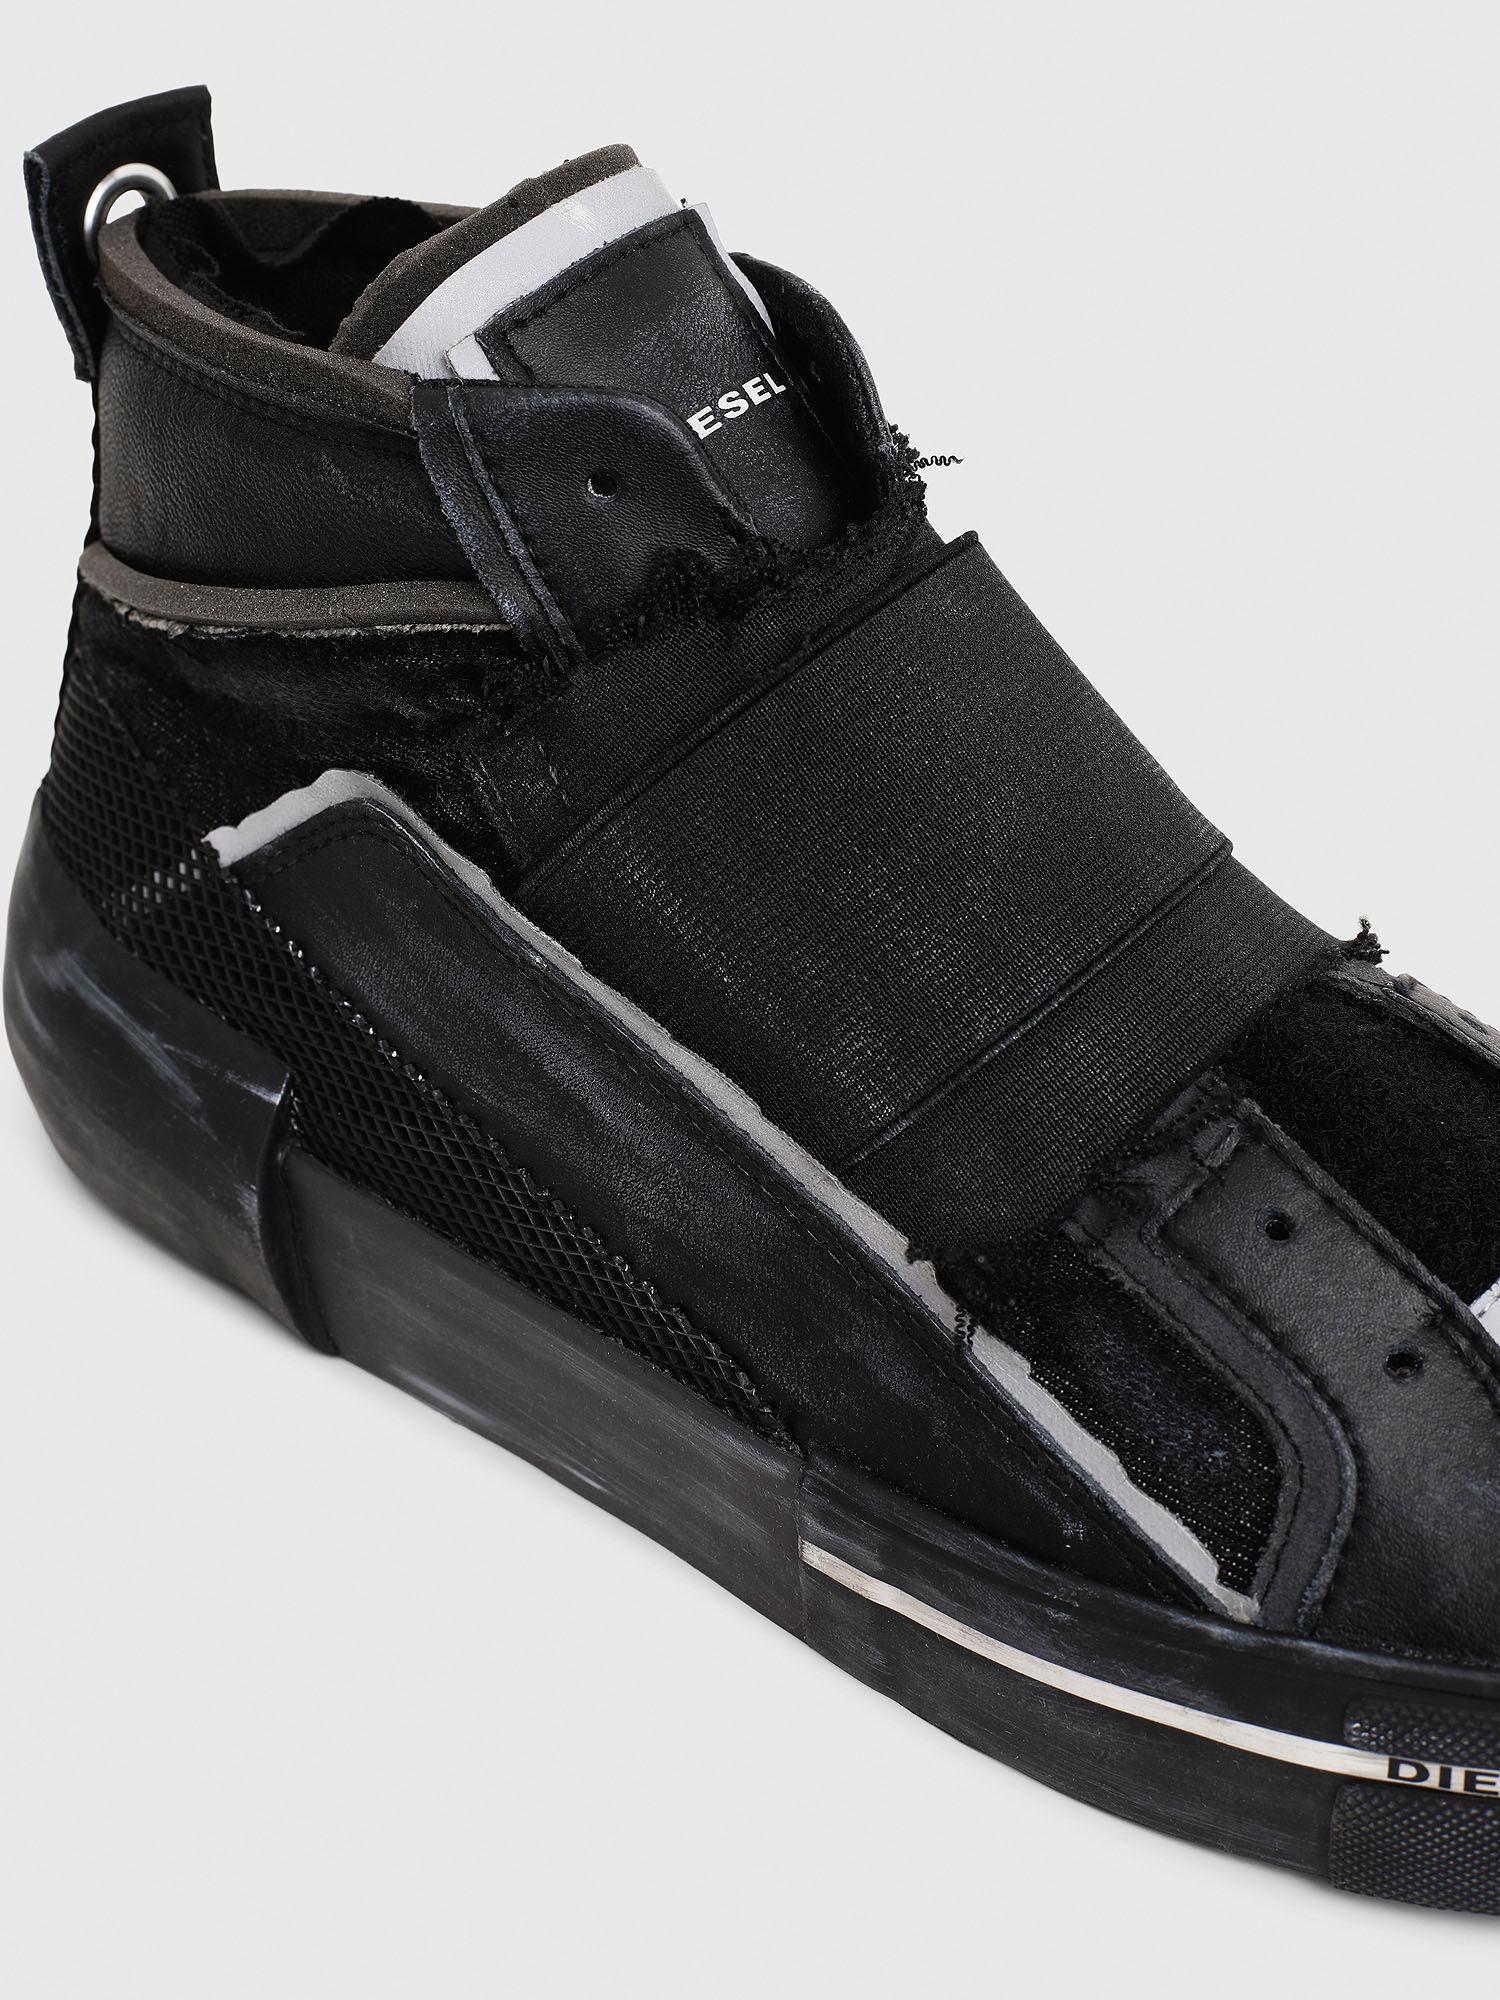 S-DESE DEC Men: High slip-on sneakers